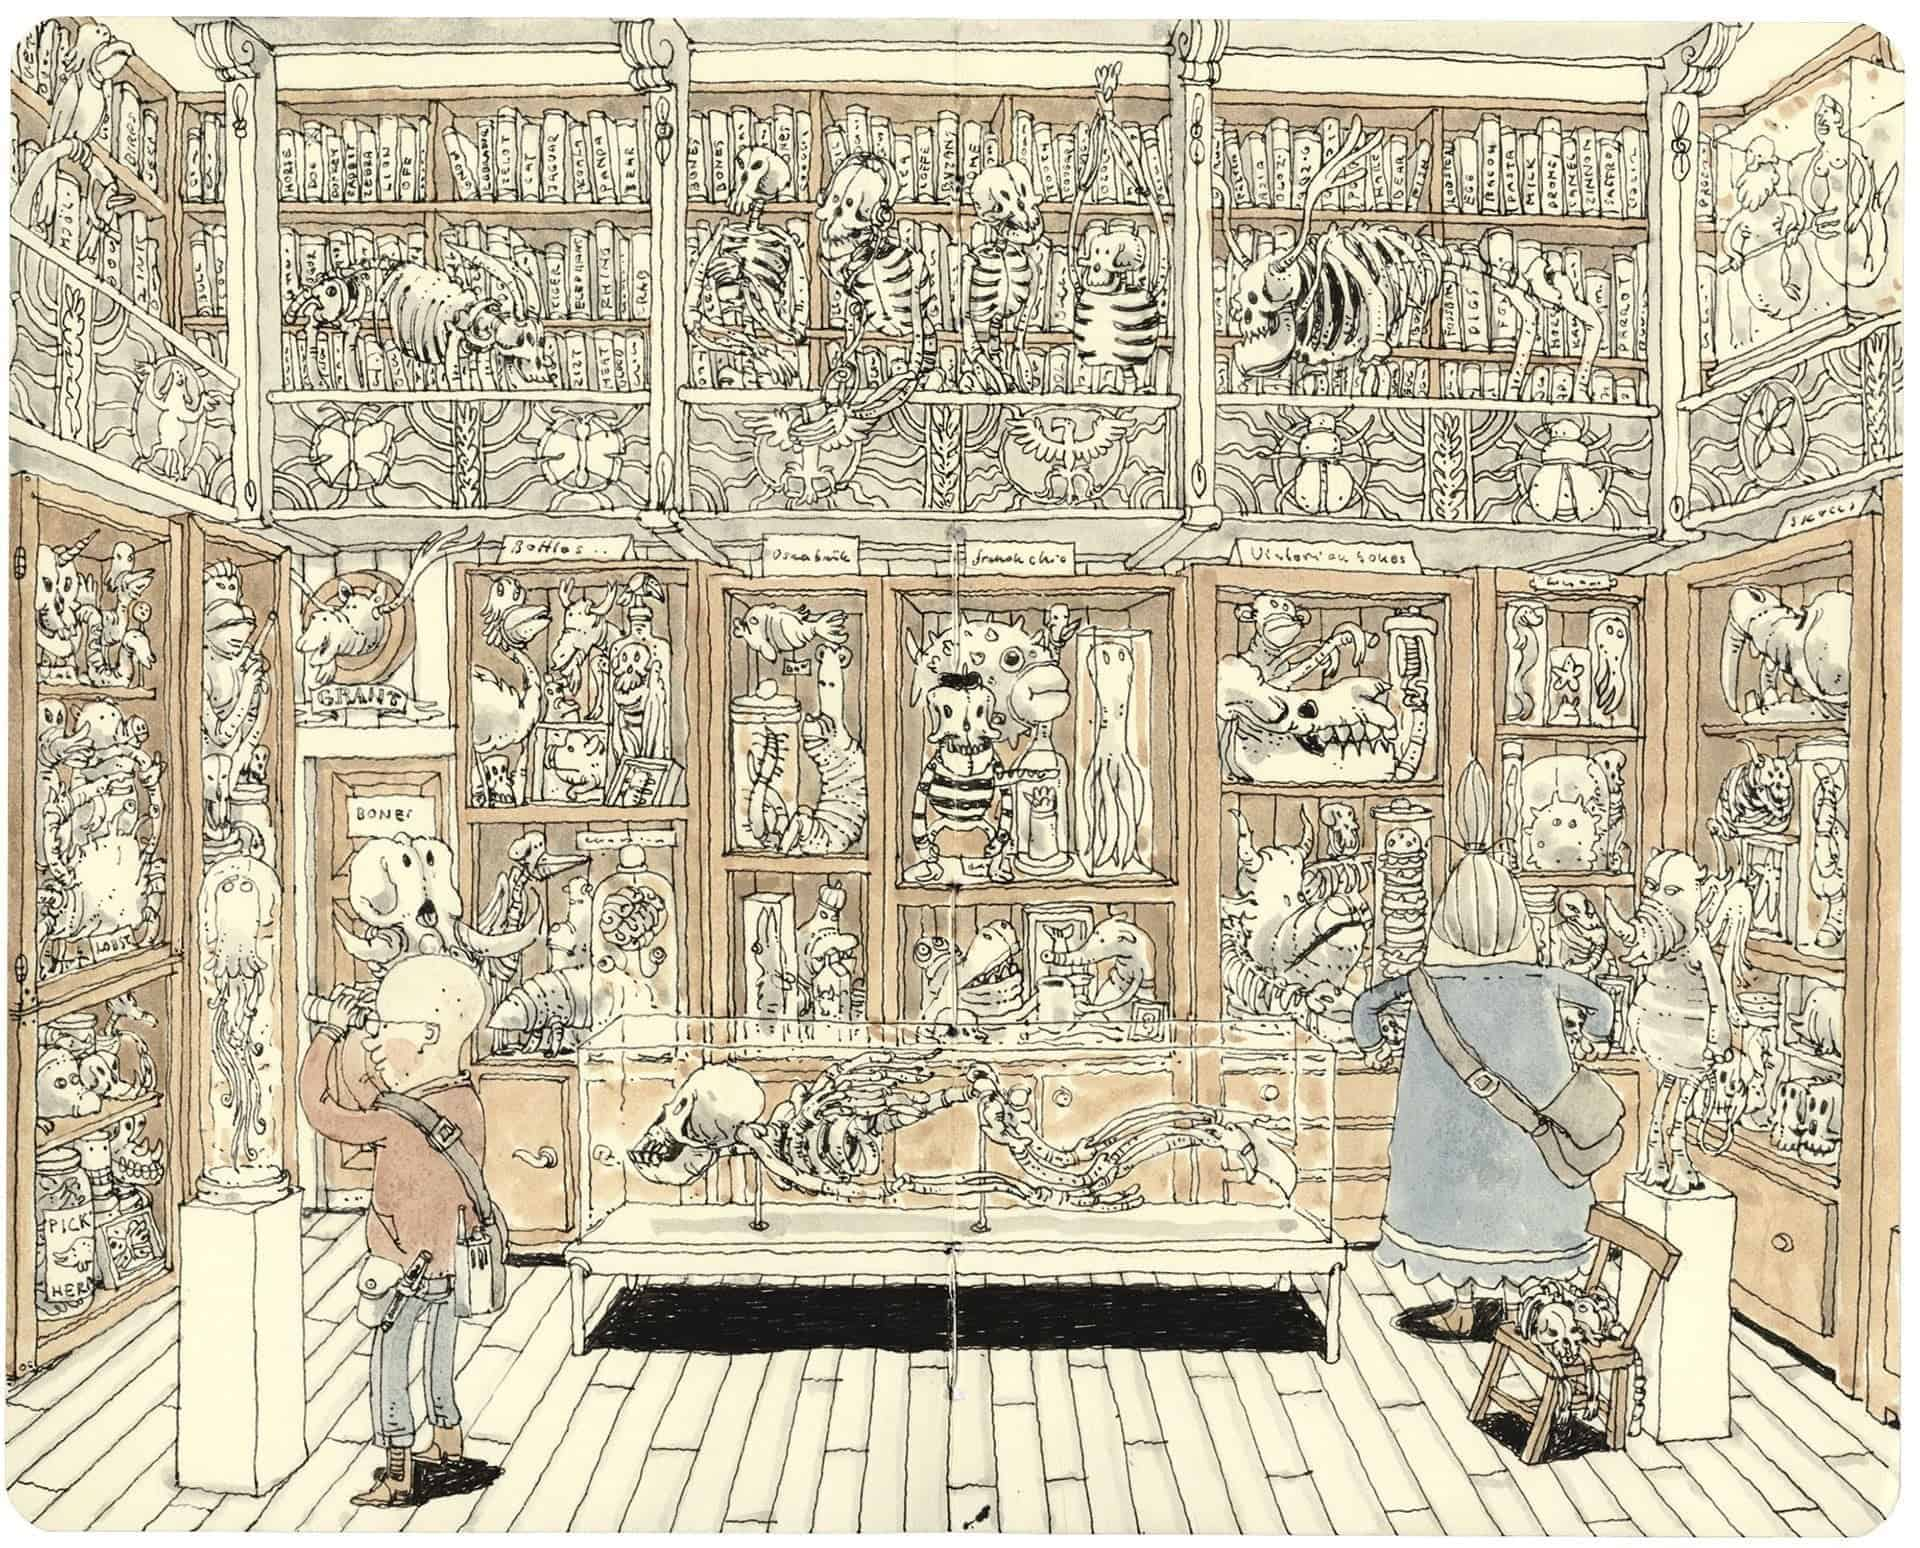 illustratie van Mattias Adolfsson